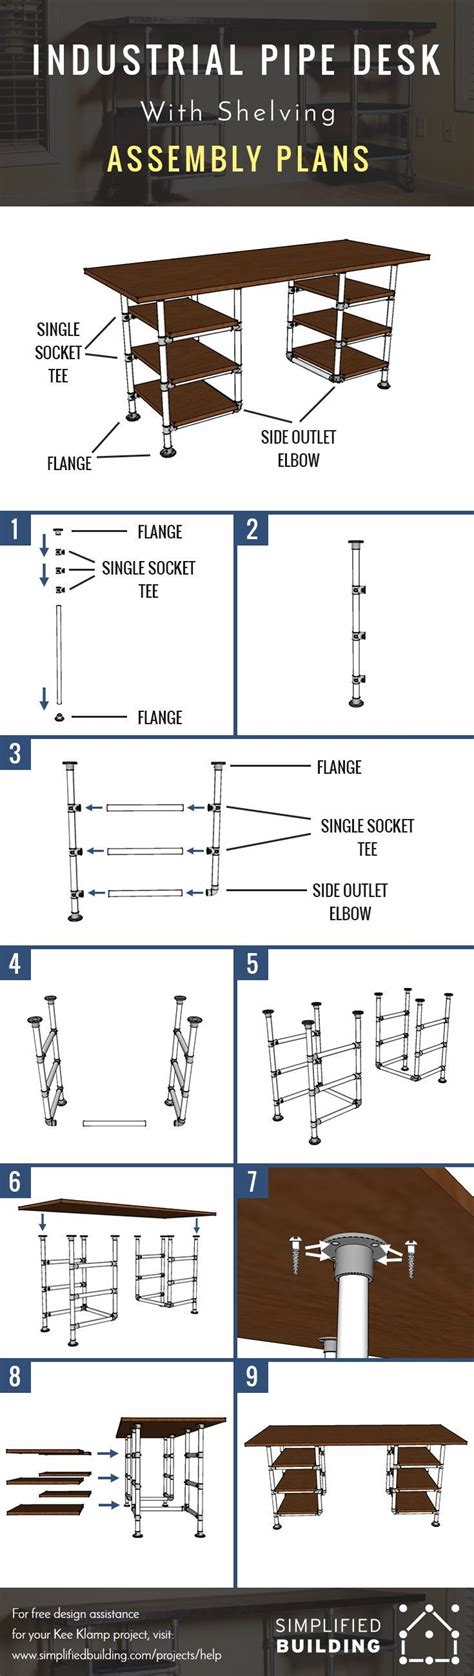 diy pipe desk plans best 25 pipe desk ideas on pinterest industrial desk